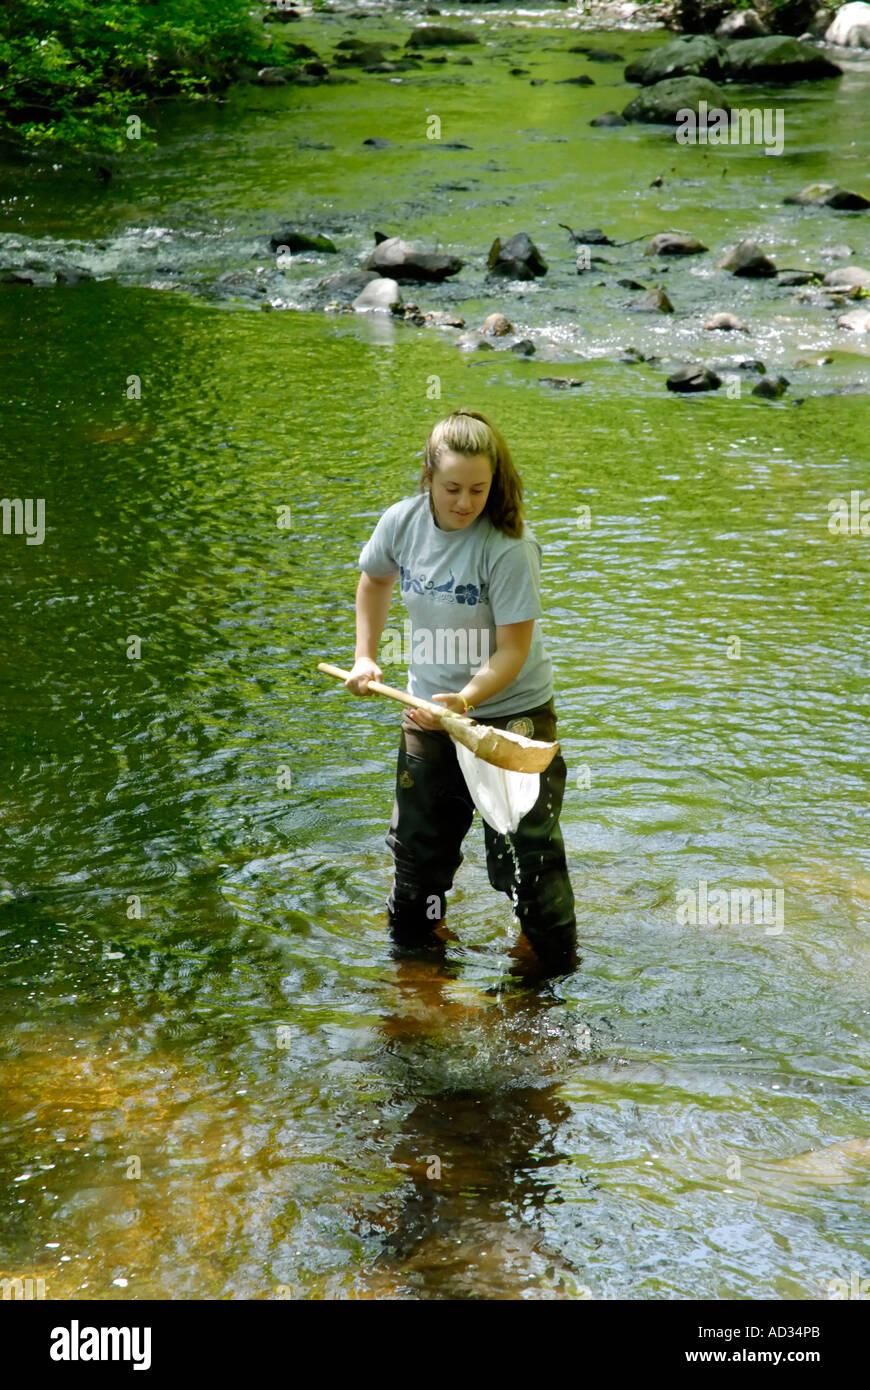 Teenage girl using net sampling river water for fish and invertebrate biological indicators of water quality - Stock Image